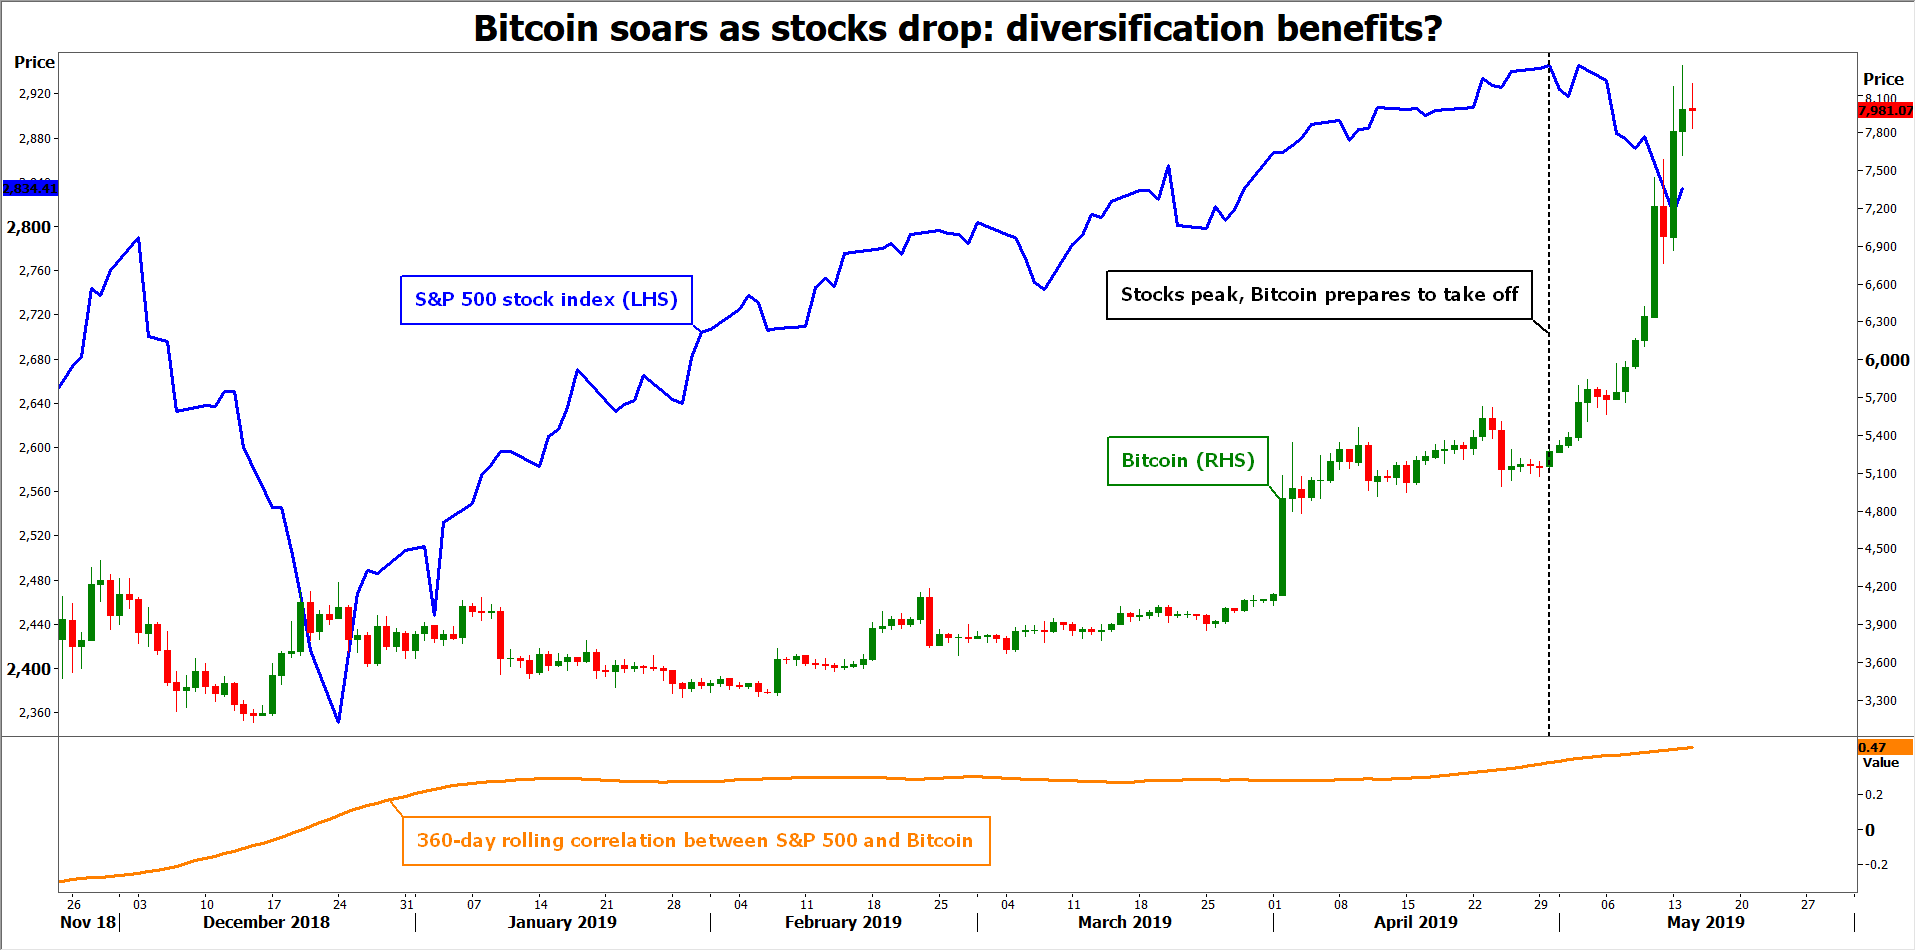 SP500 vs Bitcoin